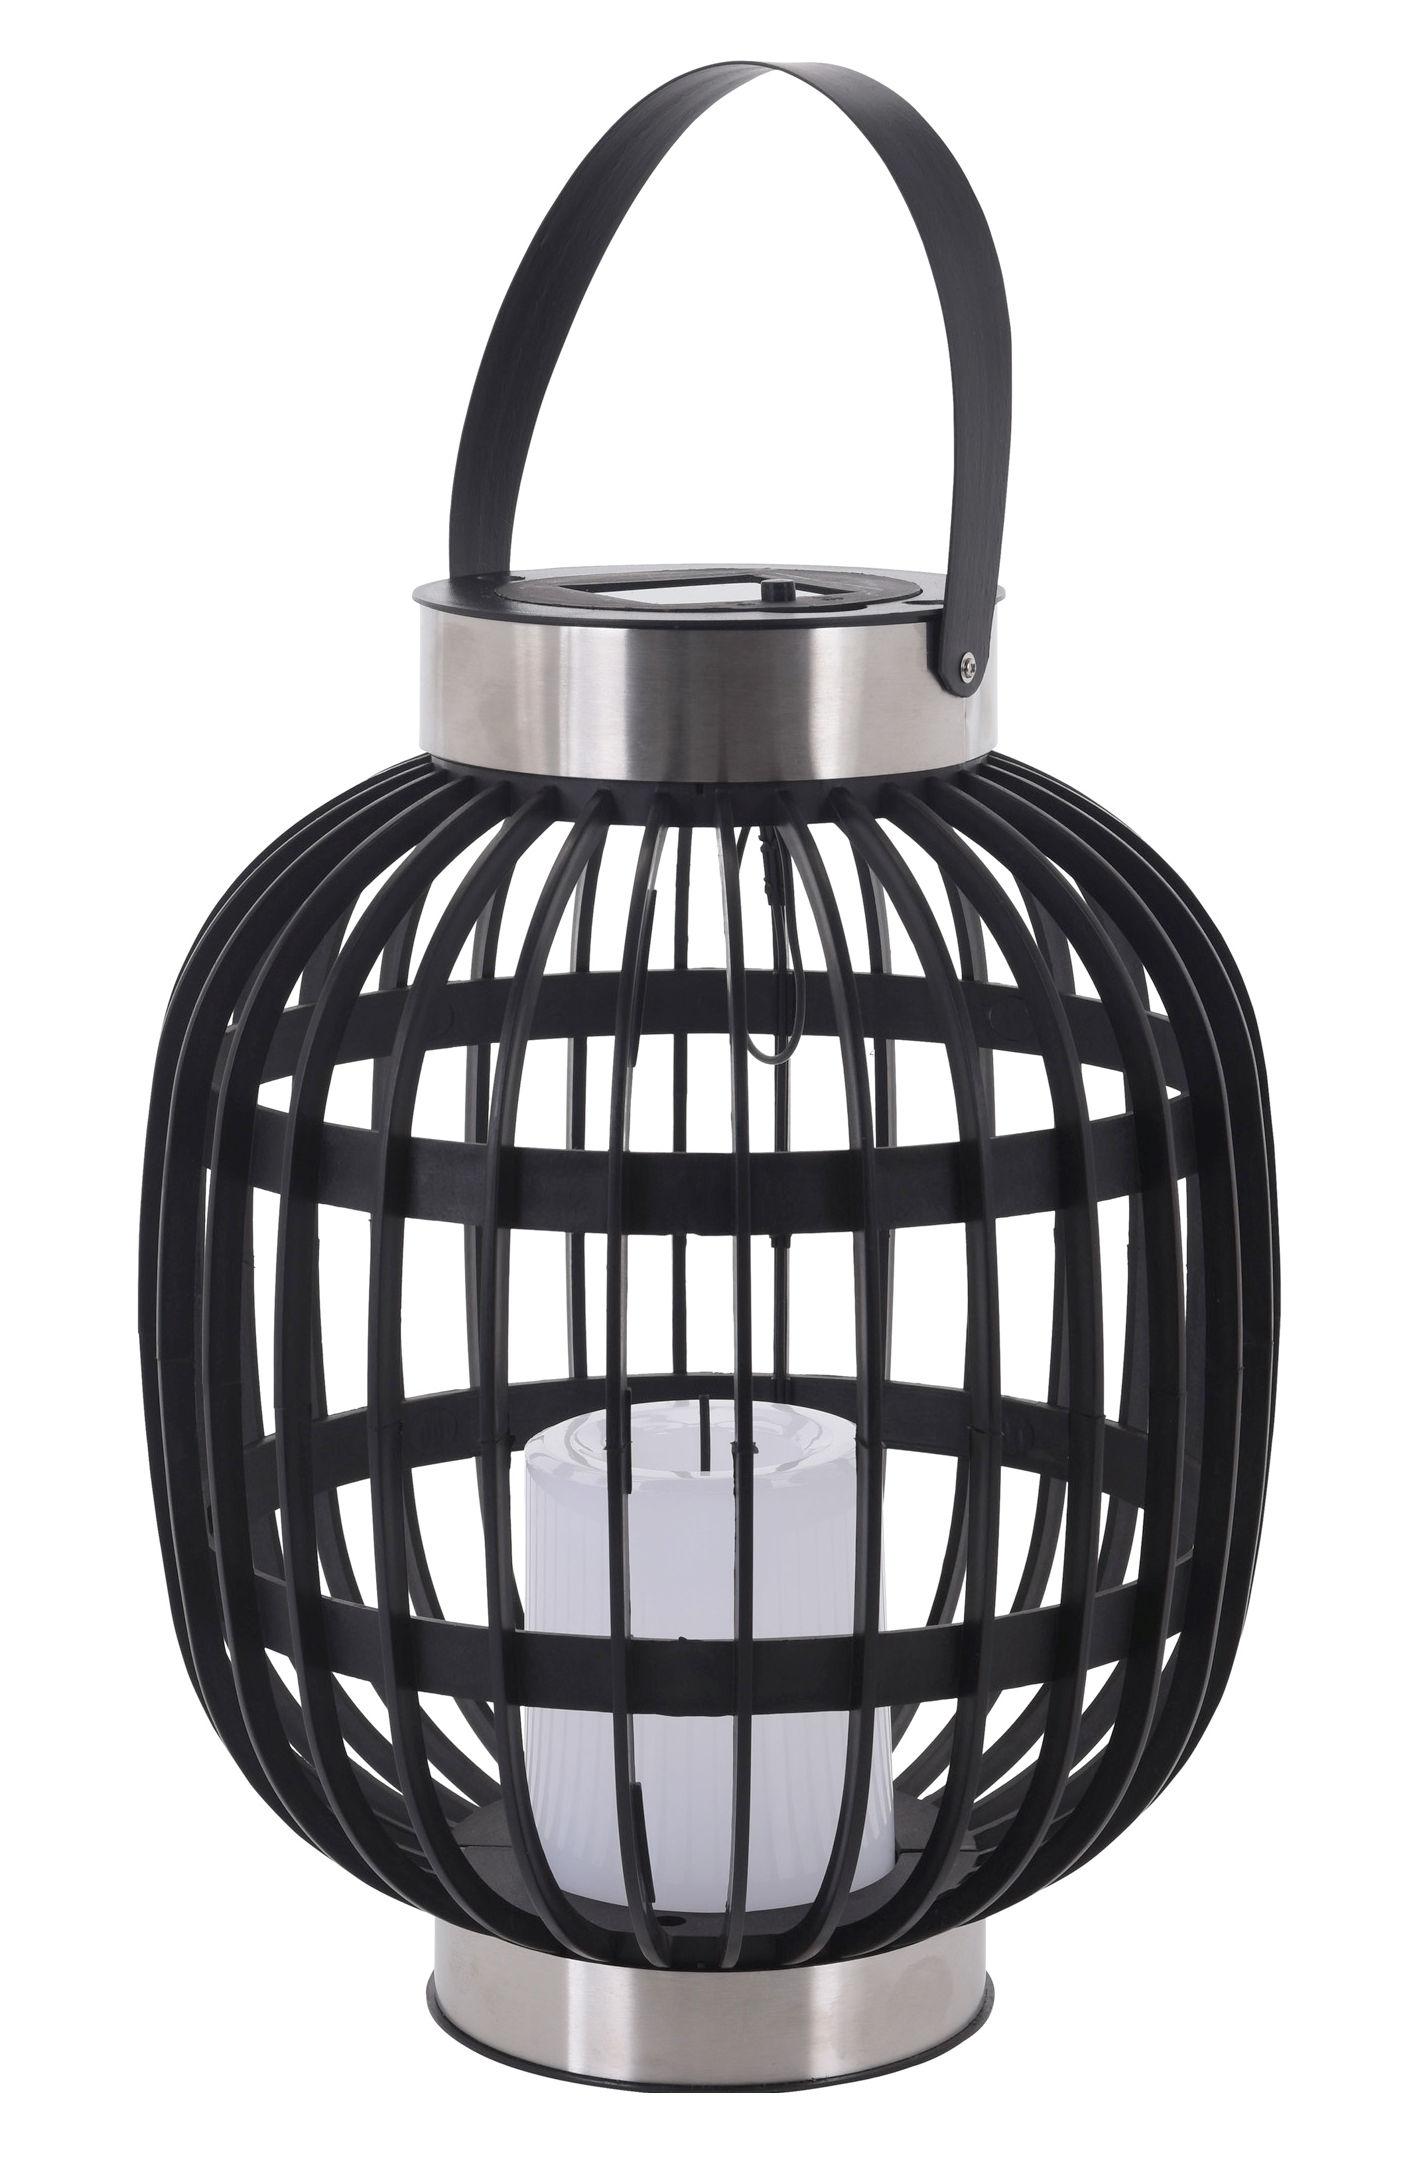 solar laterne zum h ngen 30cm garten rattan deko leuchte. Black Bedroom Furniture Sets. Home Design Ideas